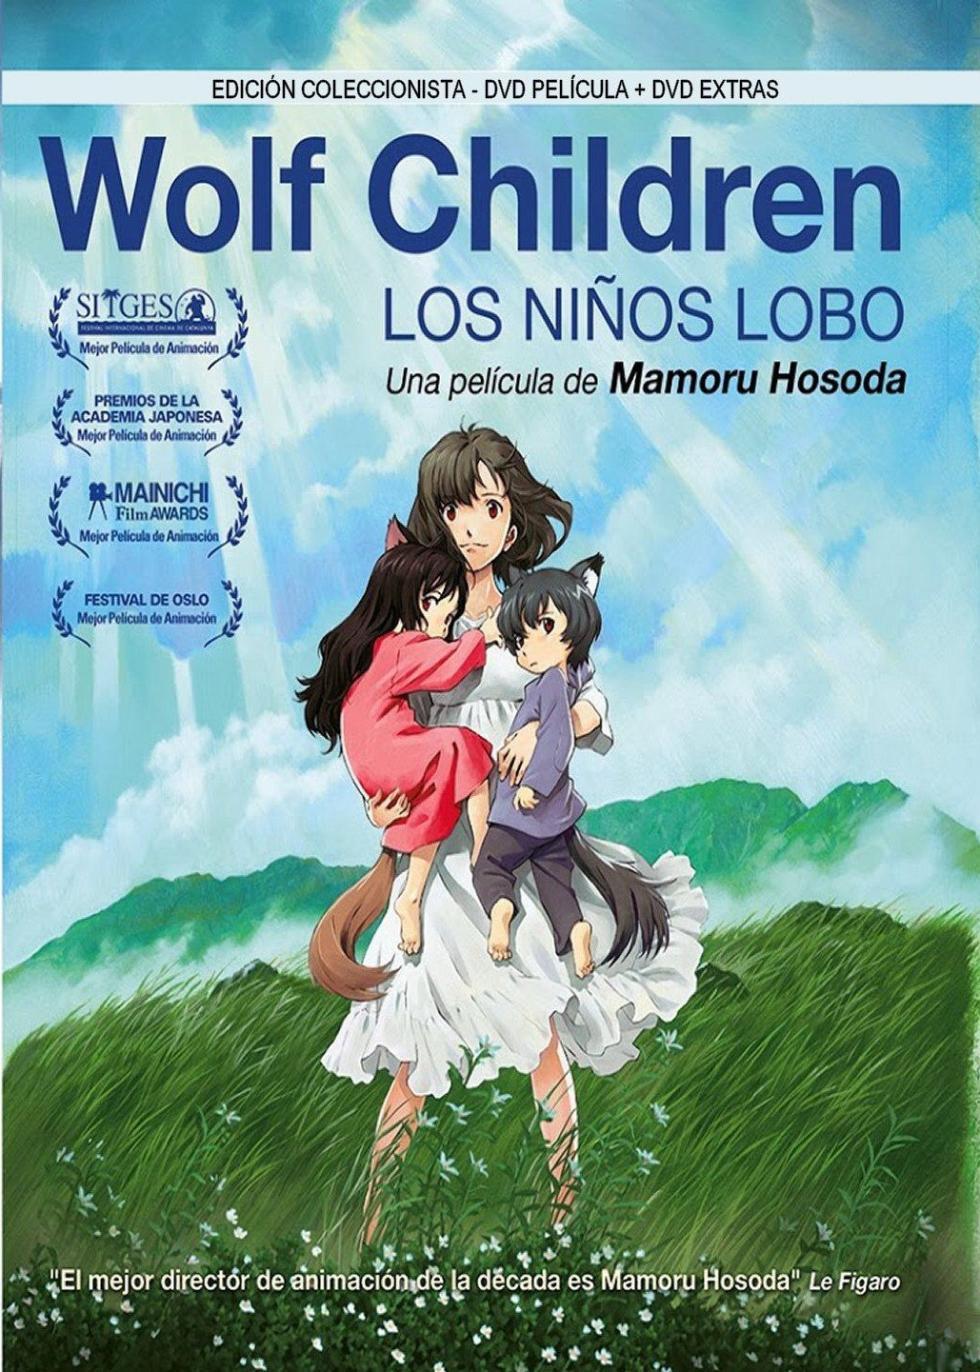 Wolf Children (Los niños lobo)